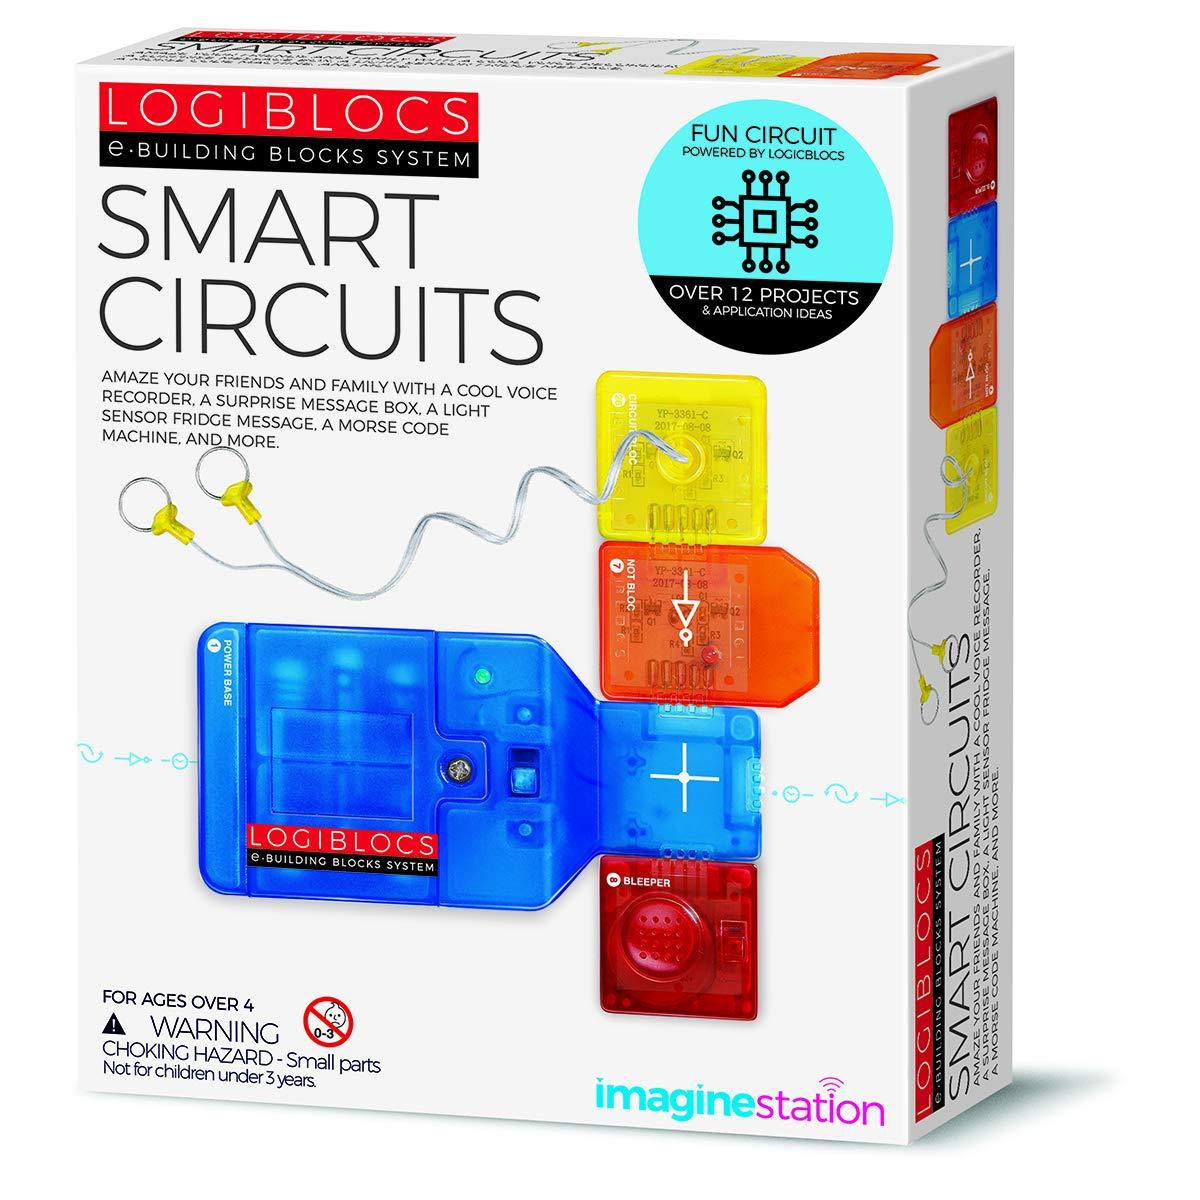 4M 406806 Logiblocs Smart Circuit, White